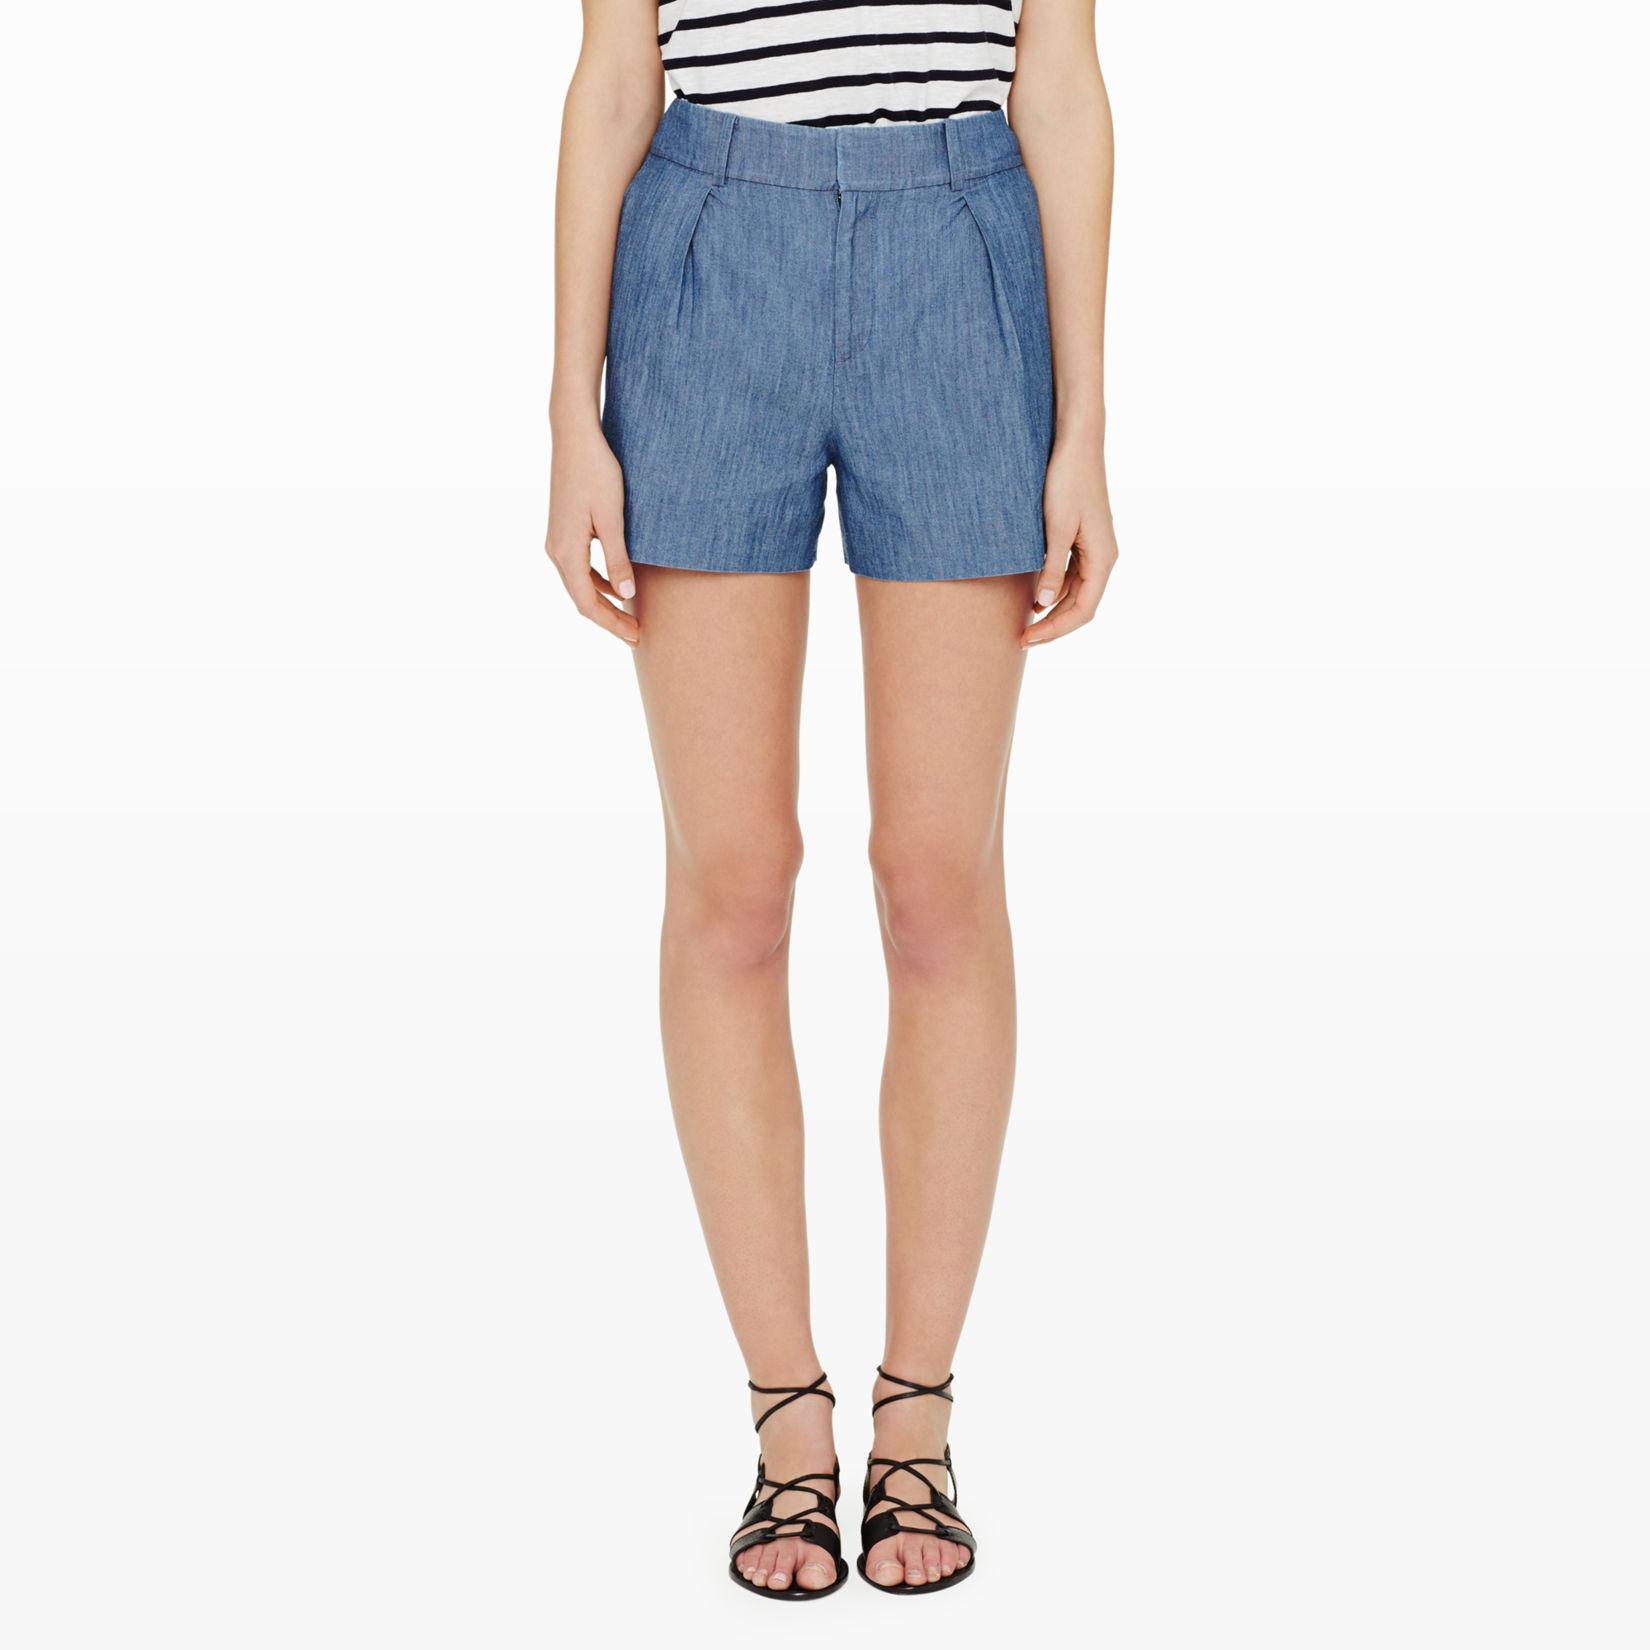 Womens | Shorts | Pergie High Waisted Shorts | Club Monaco